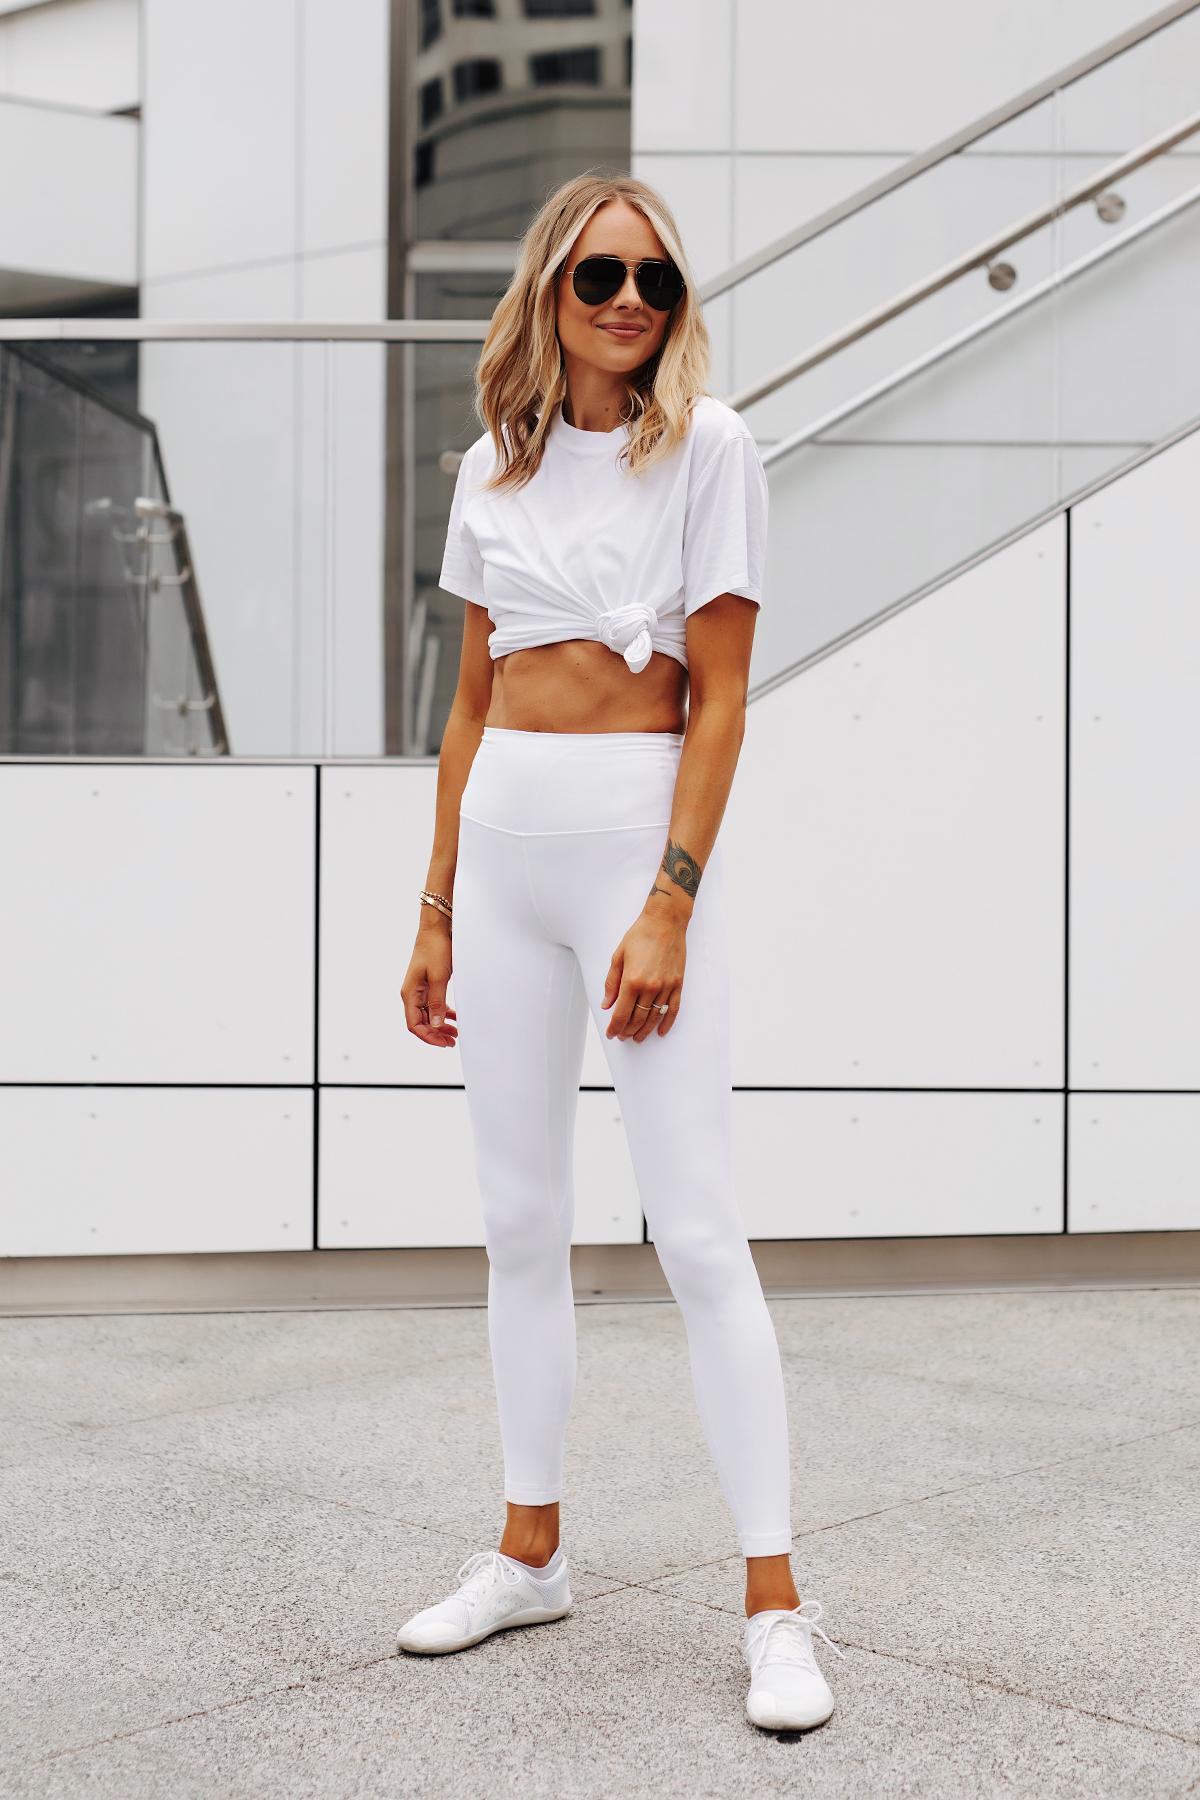 Fashion Jackson Wearing lululemon White Tshirt lululemon White Align Leggings White Vivo Barefoot Sneakers